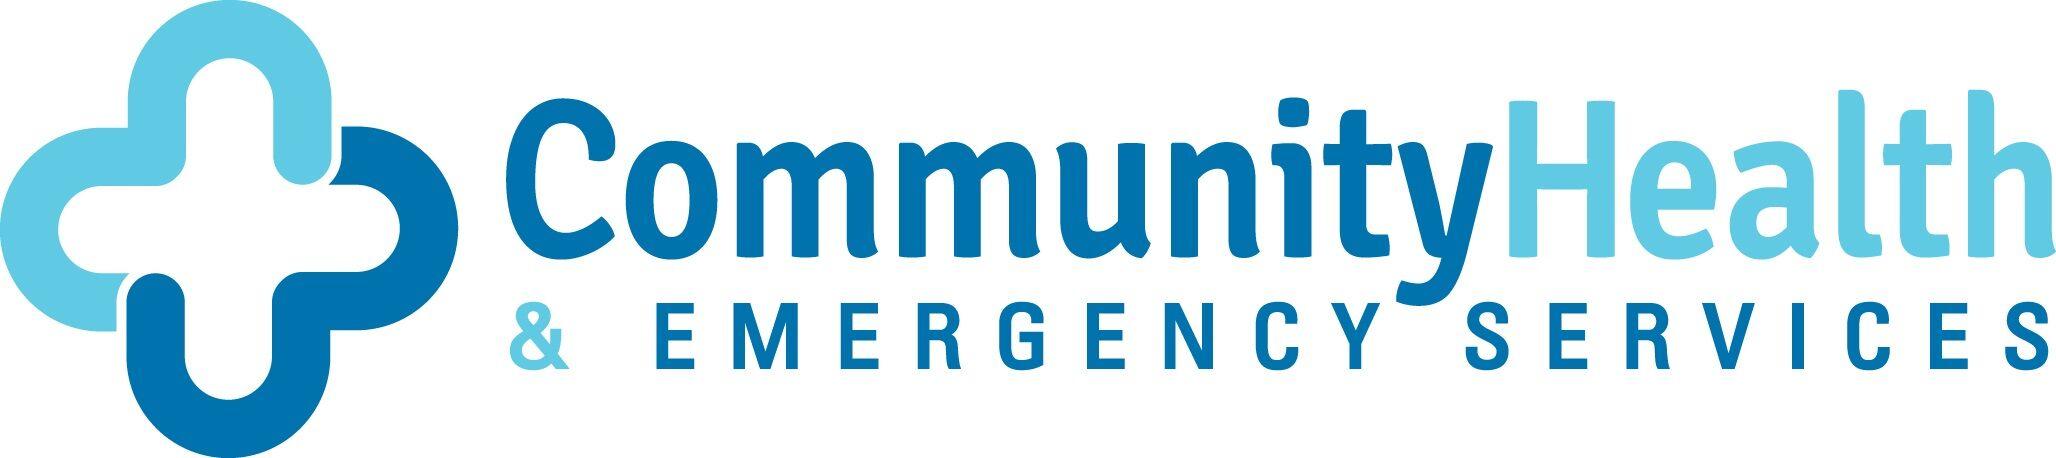 Community Health & Emergency Services, Inc.